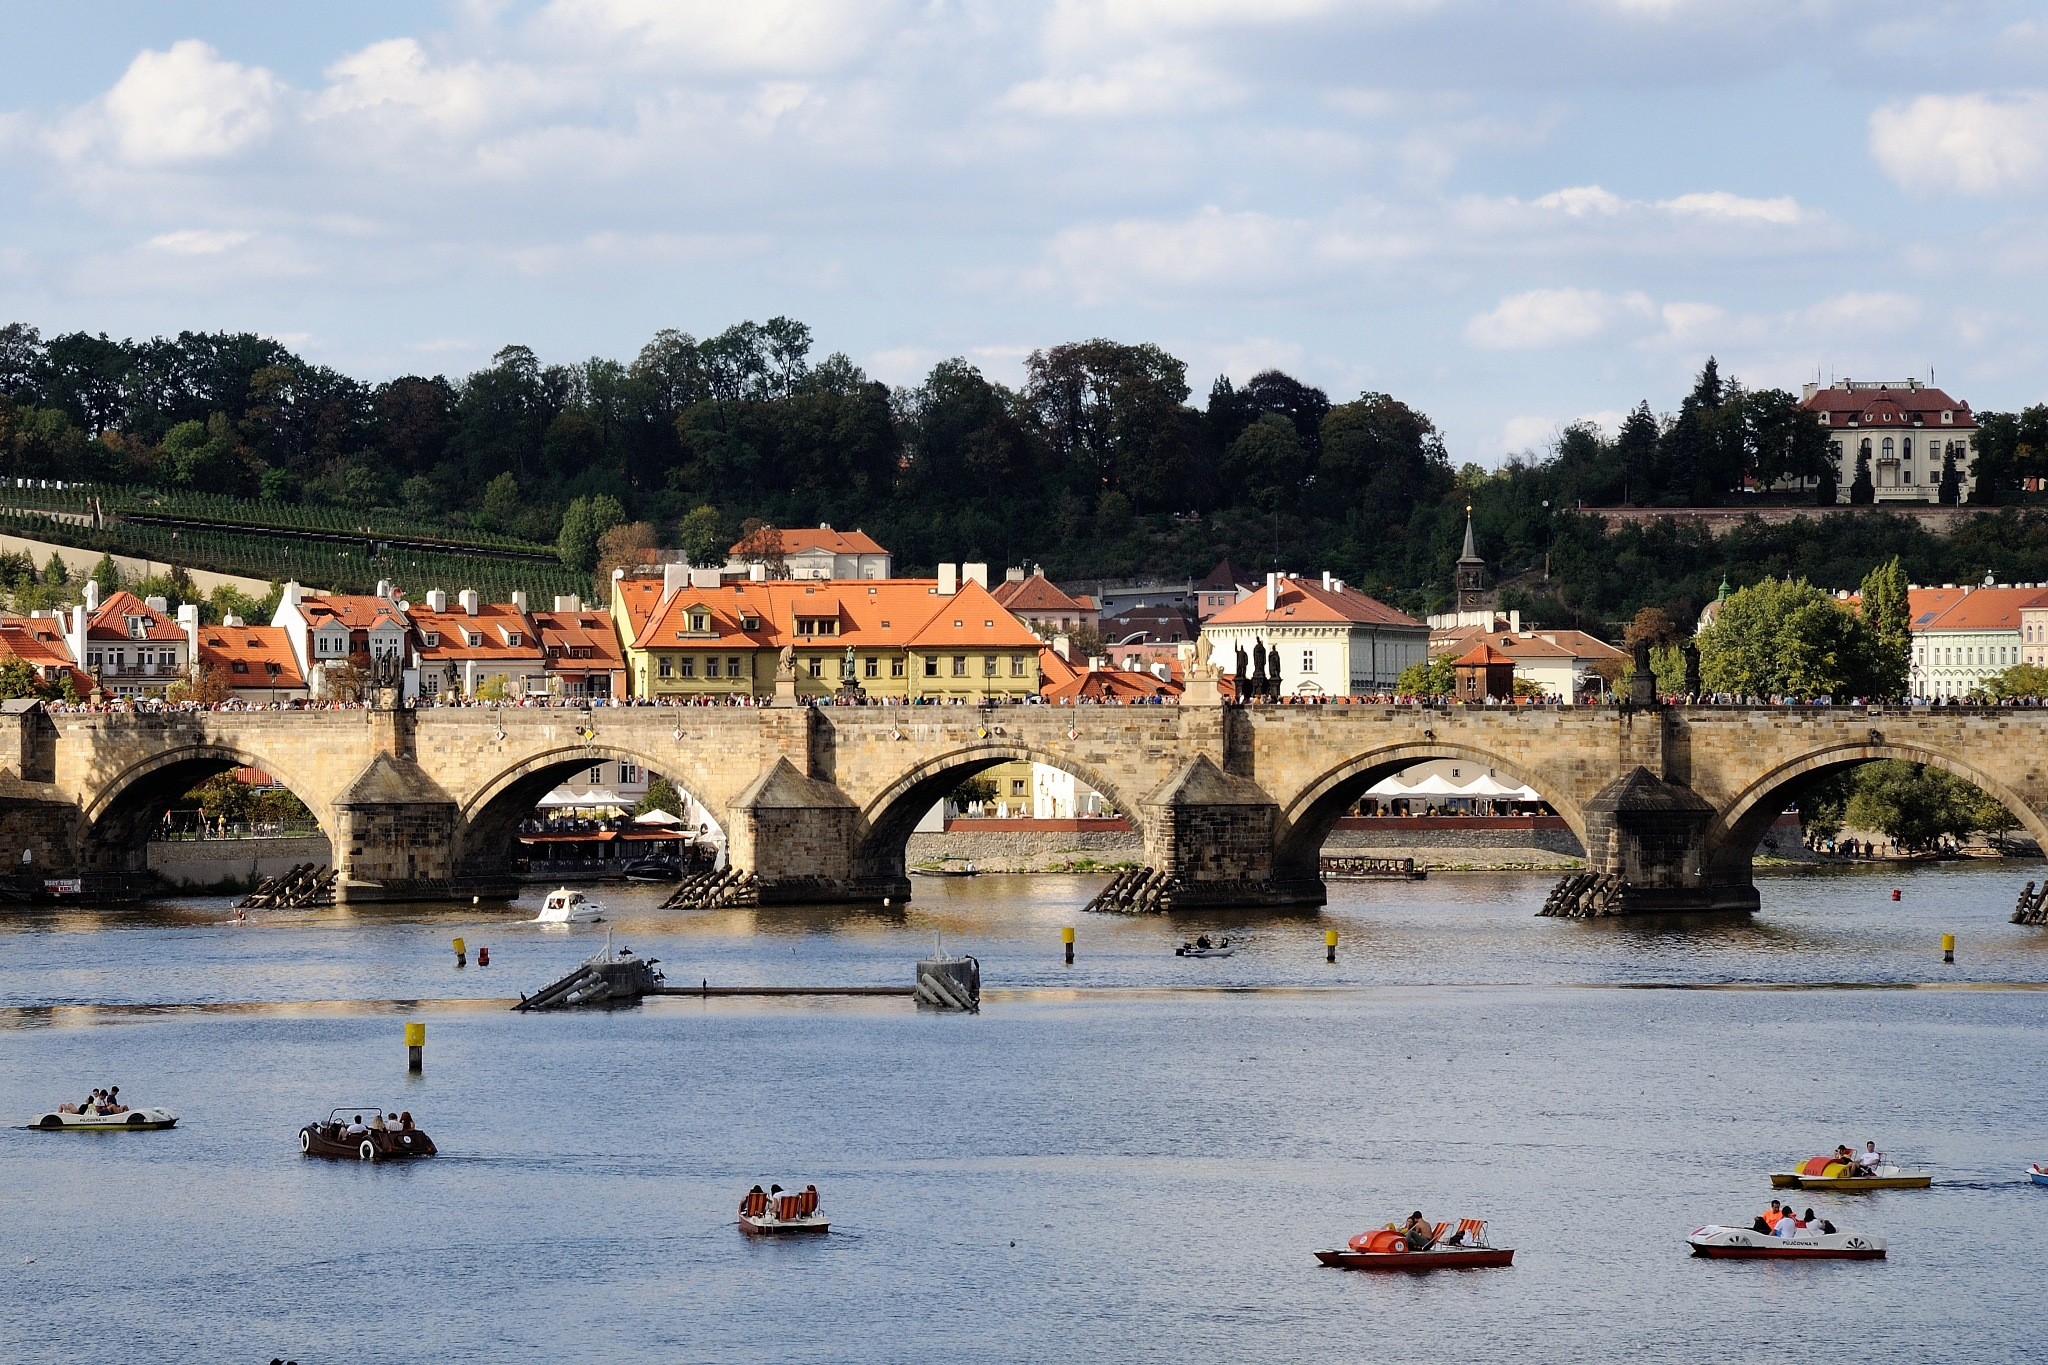 Charles Bridge, Prague by Zdenek Krchak